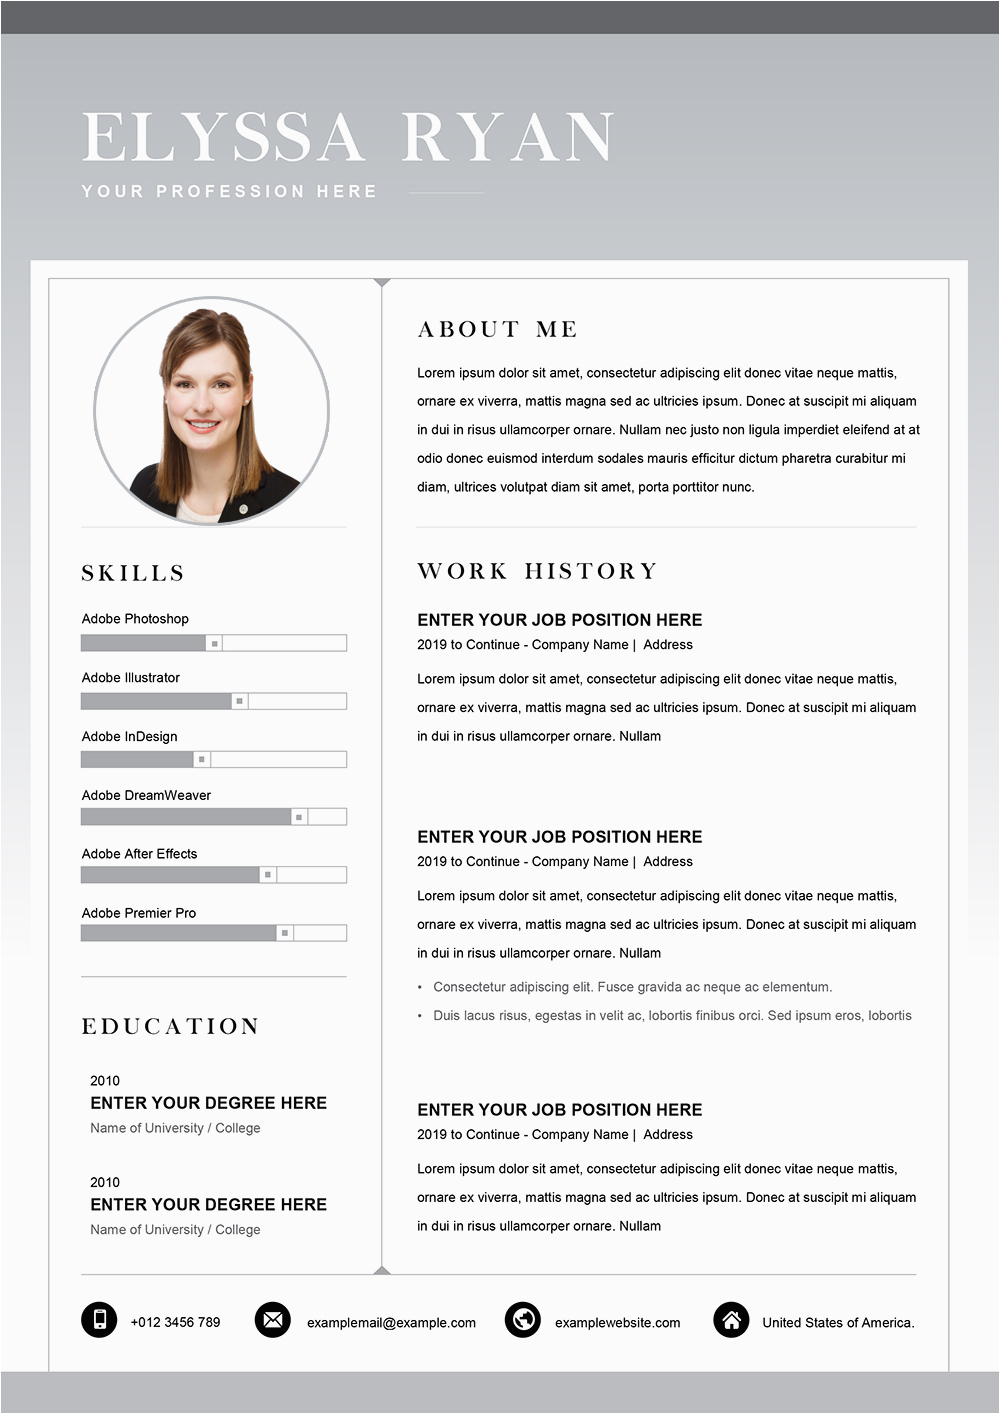 job application resume template